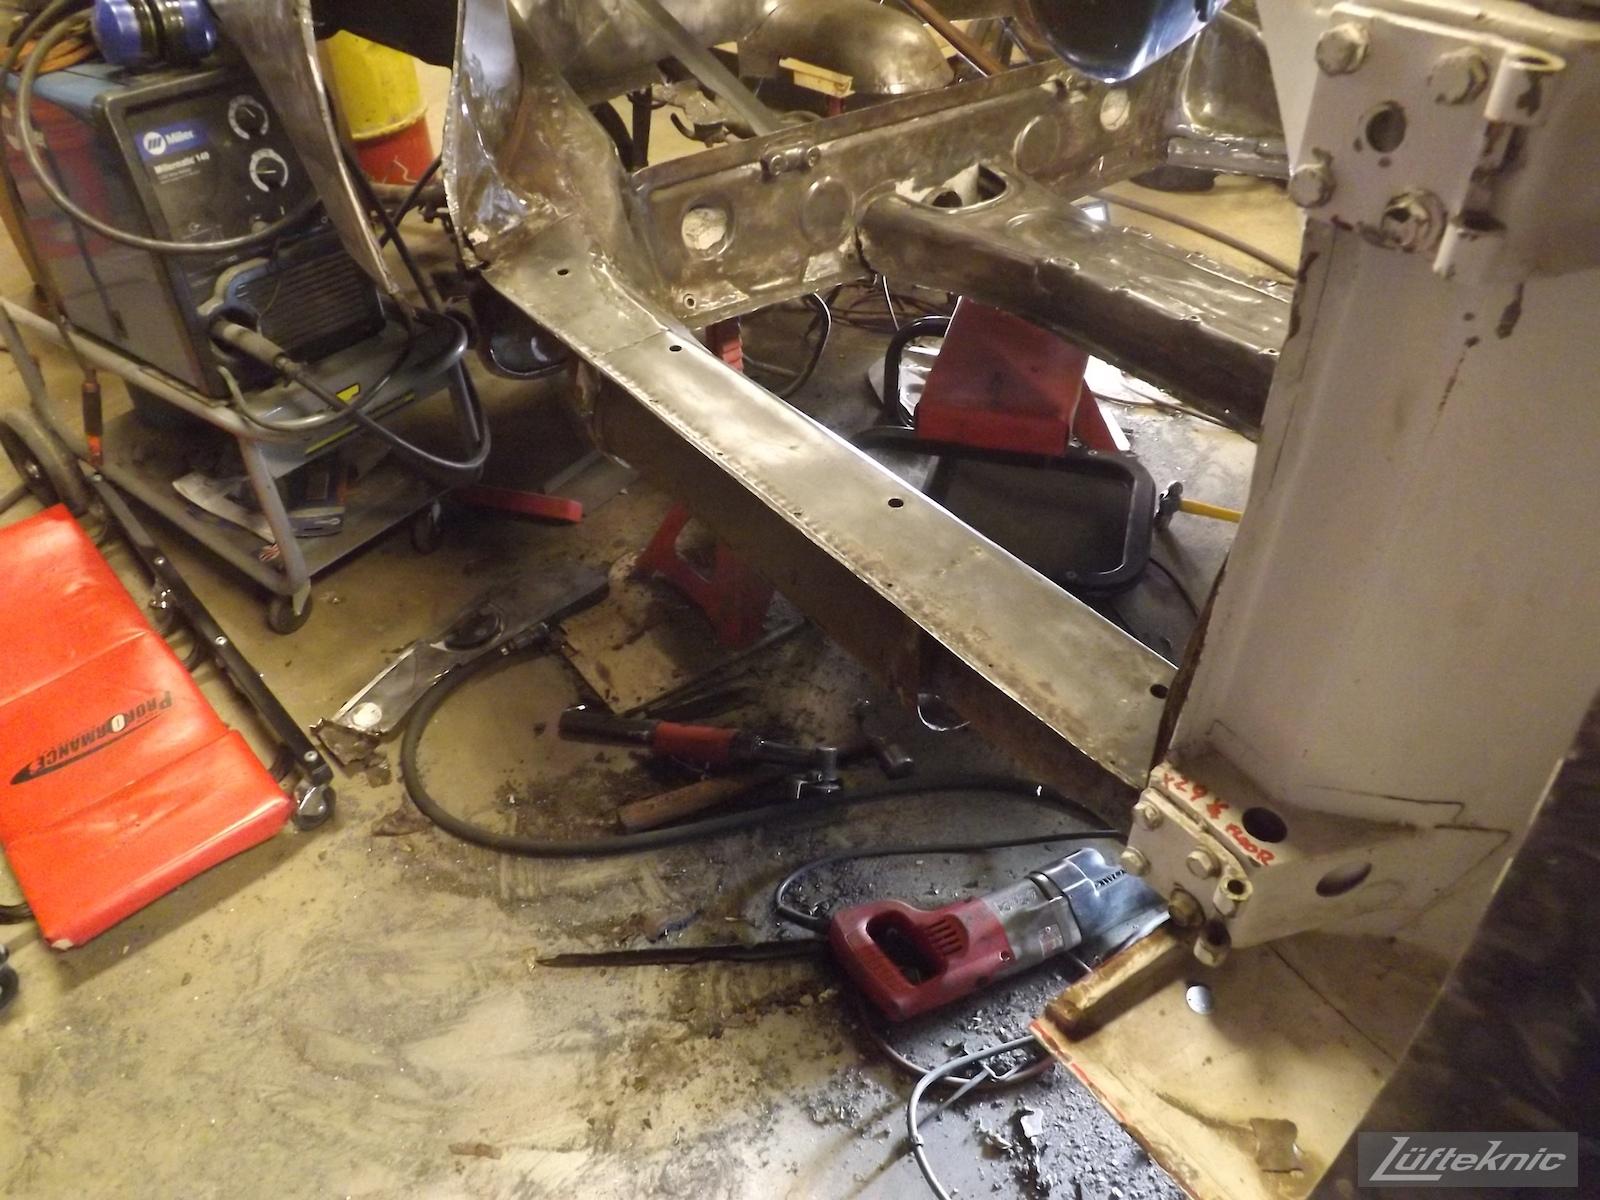 Chassis repair on a white 1964 Porsche 356SC restoration.